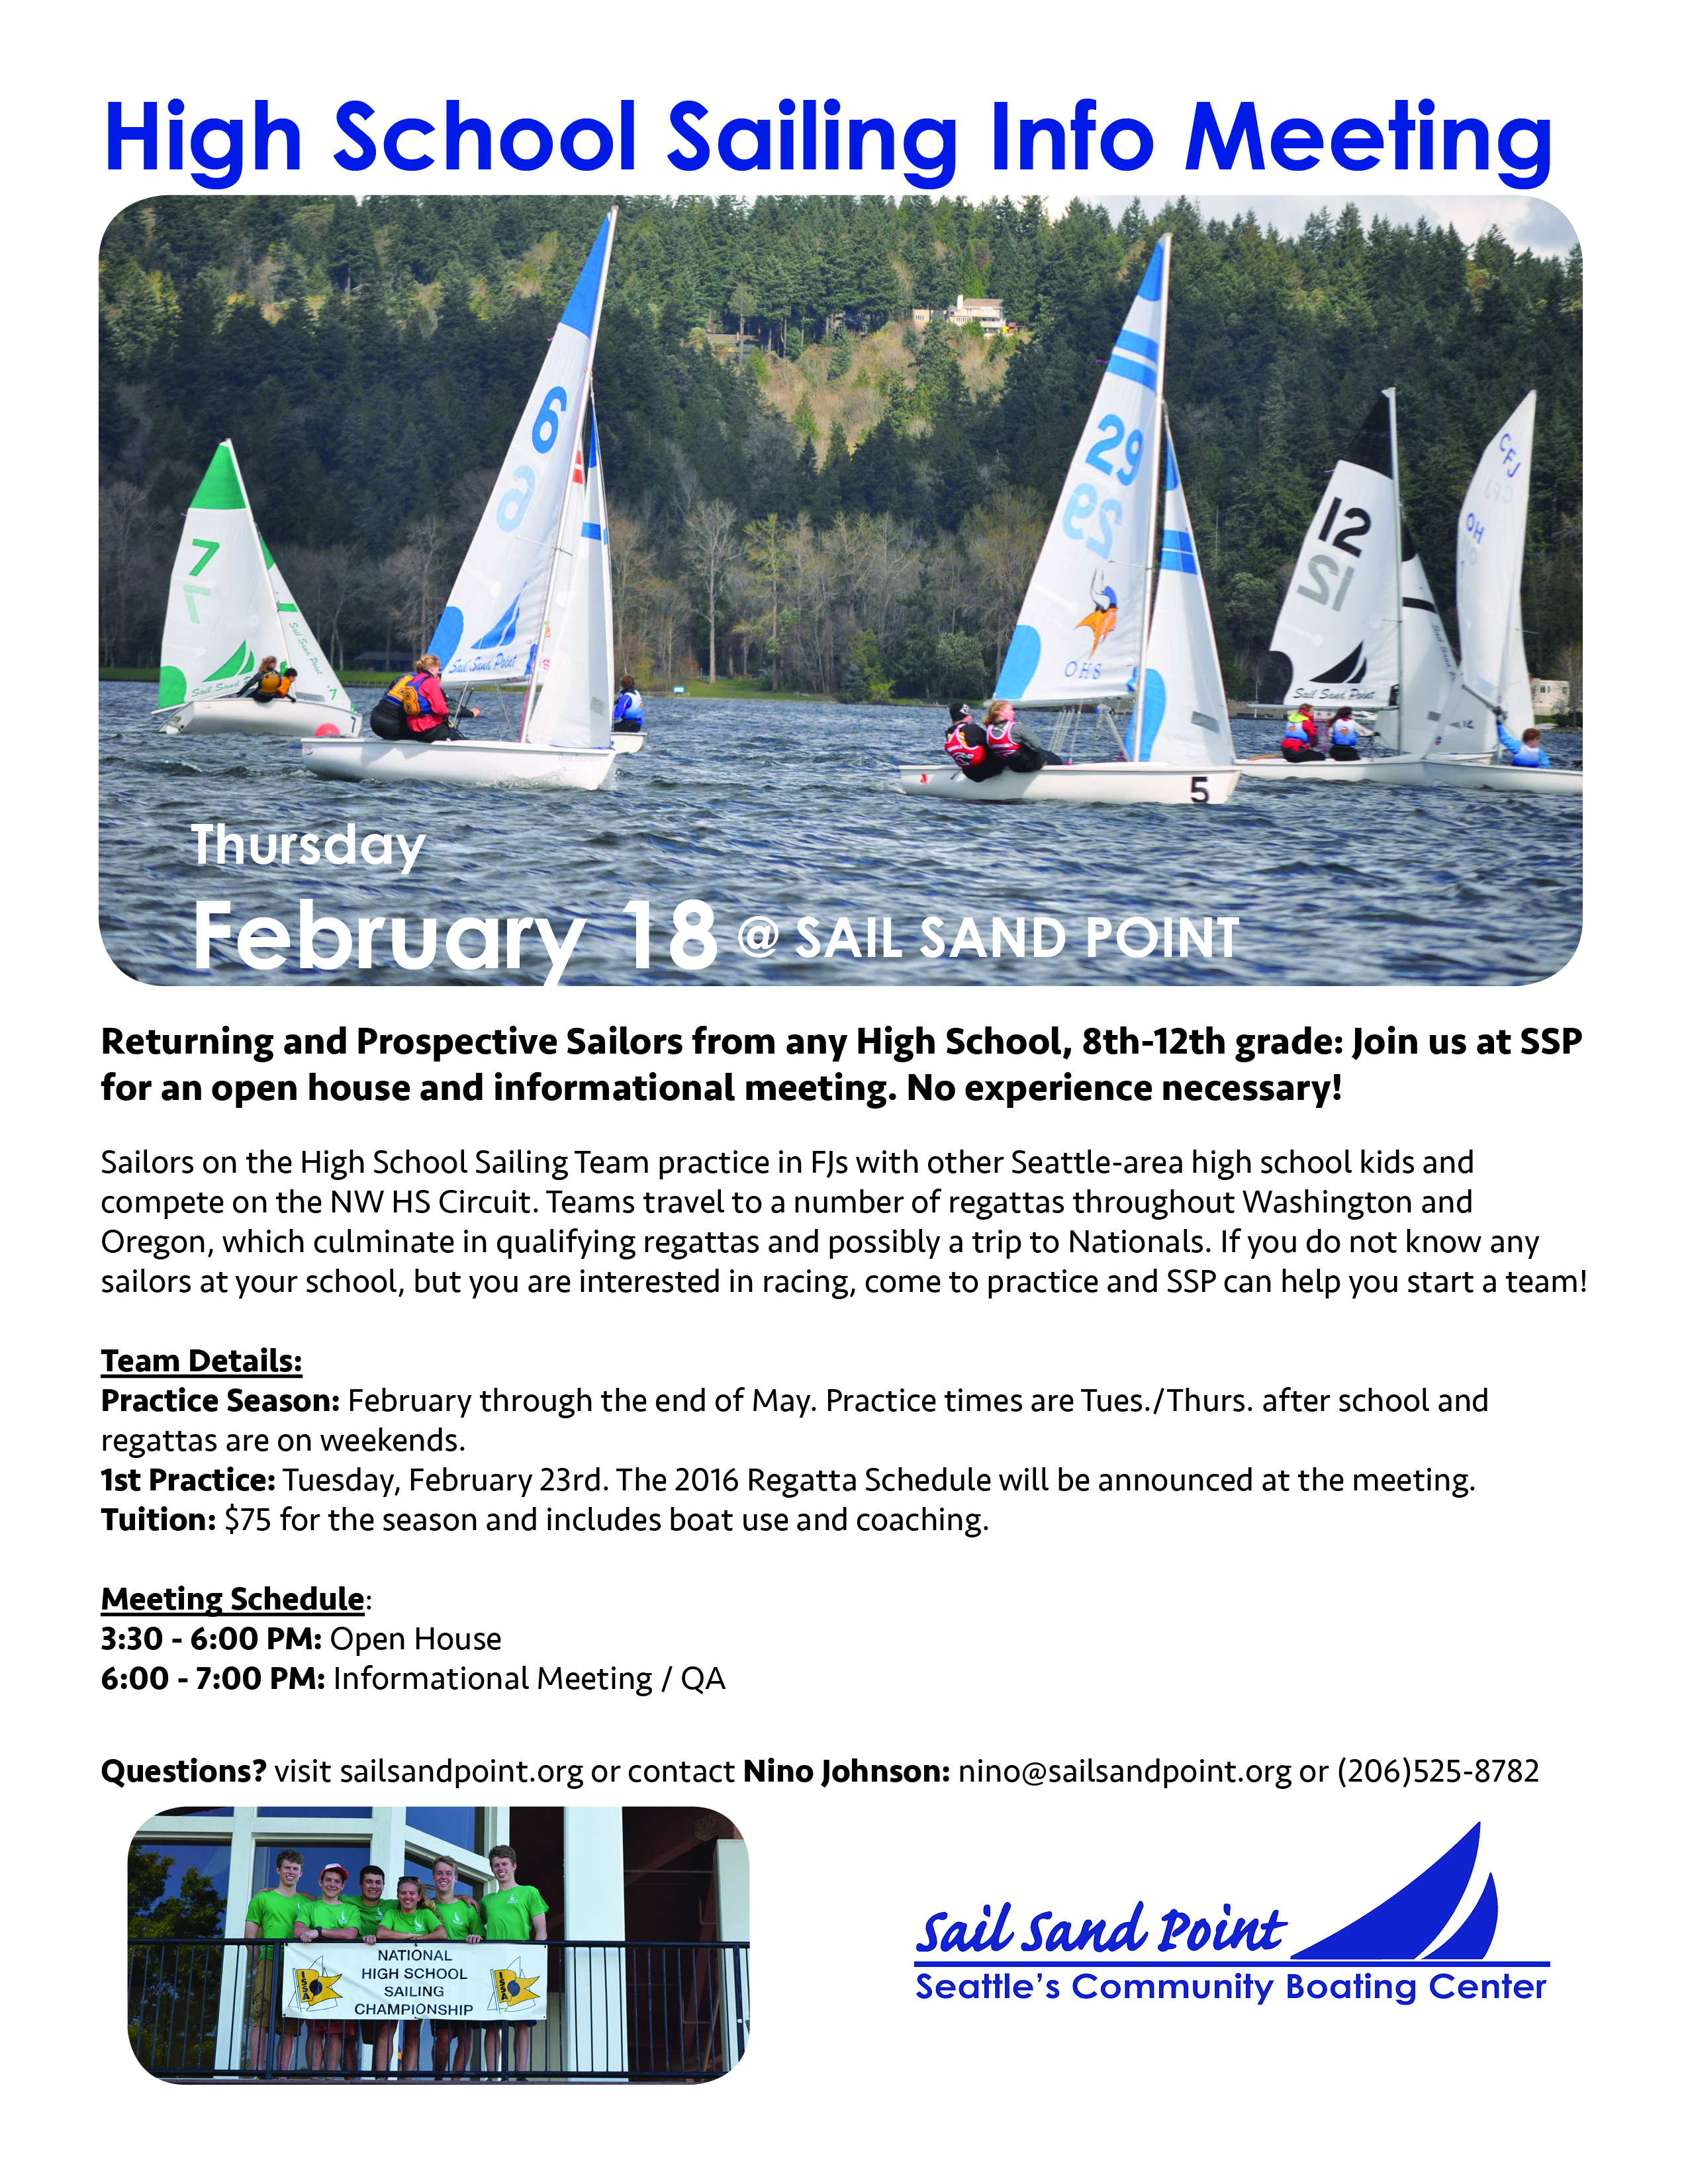 High School Sailing Info Meeting Flyer 2016